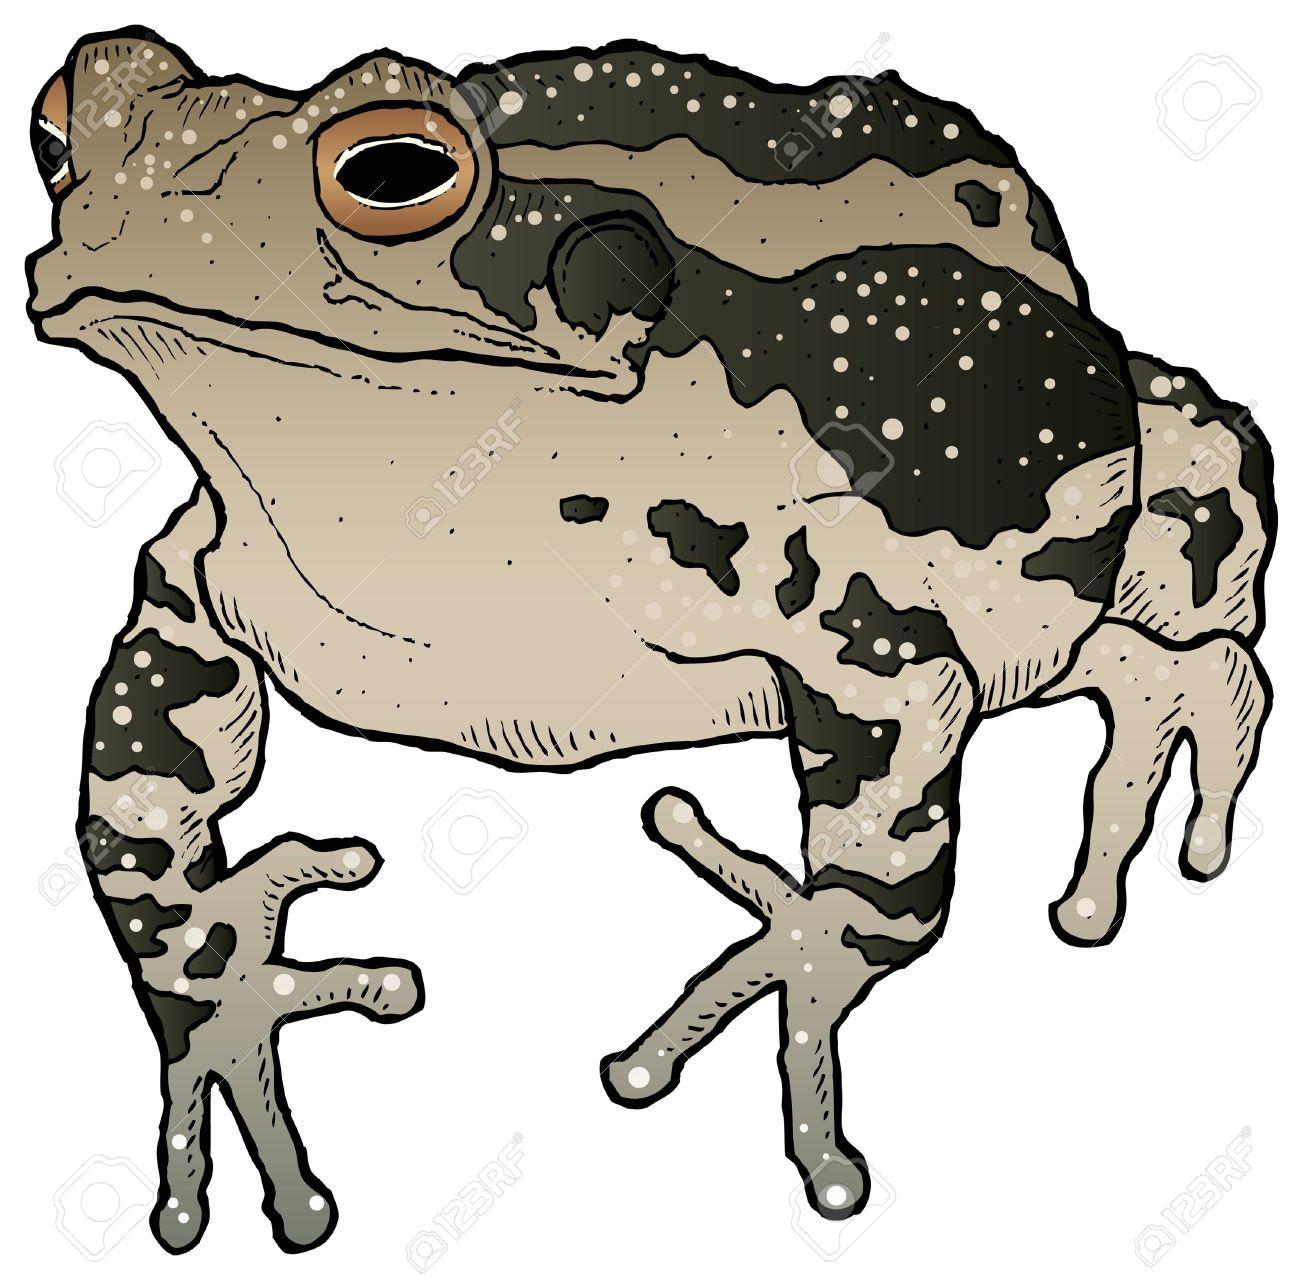 a hand drawn ink vector of a toad royalty free cliparts vectors rh 123rf com